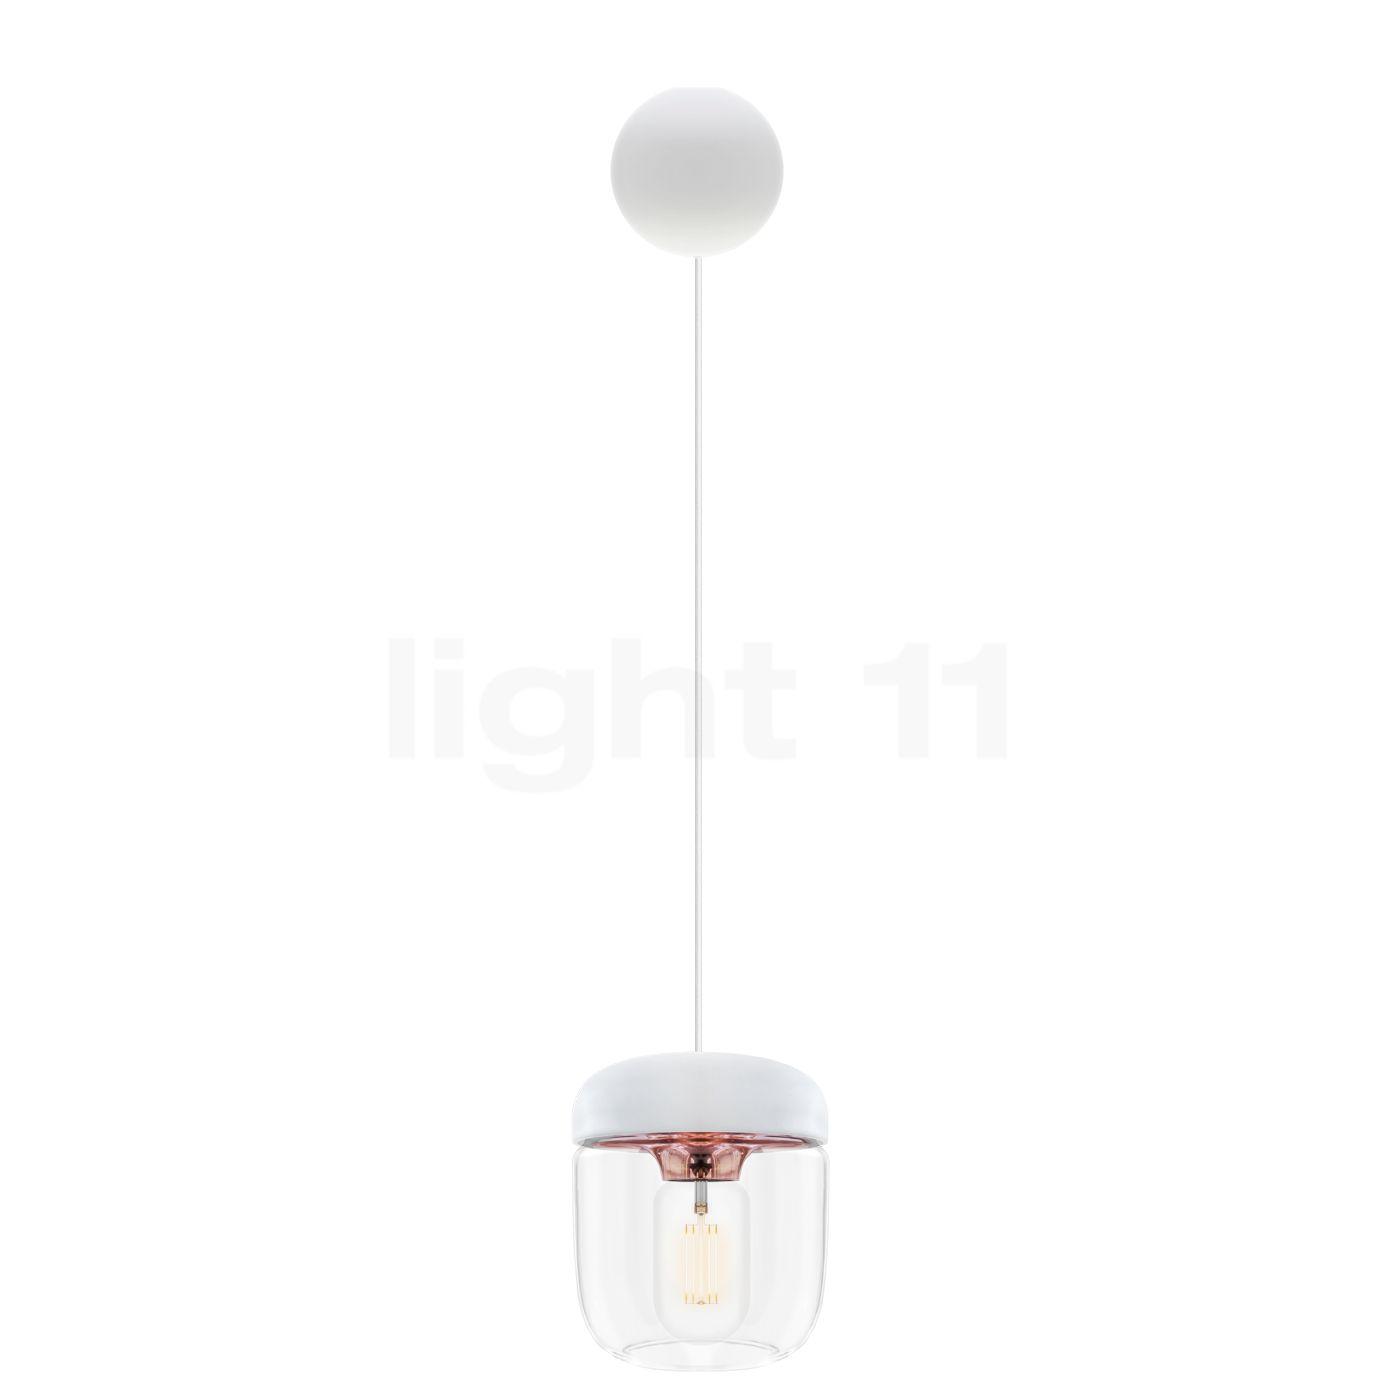 Top UMAGE Acorn Cannonball Pendelleuchte weiß - light11.de TT78